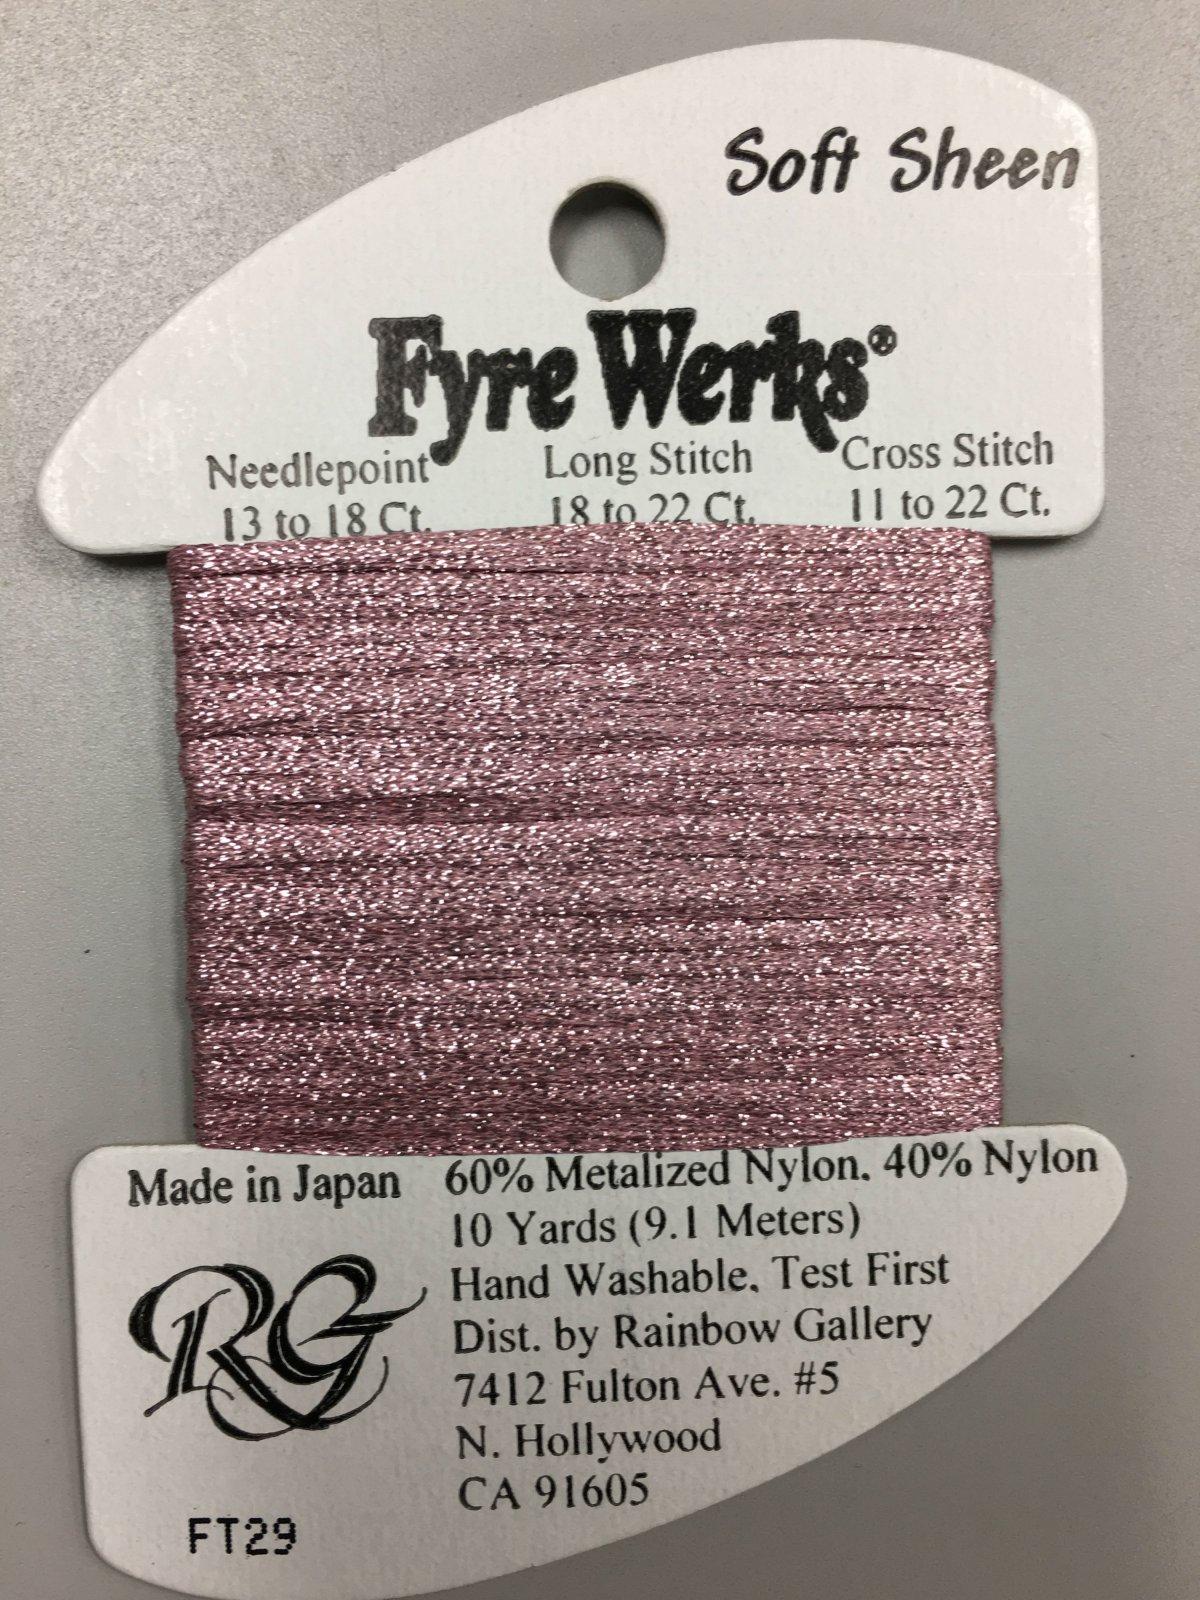 Fyre Werks Soft Sheen FT29